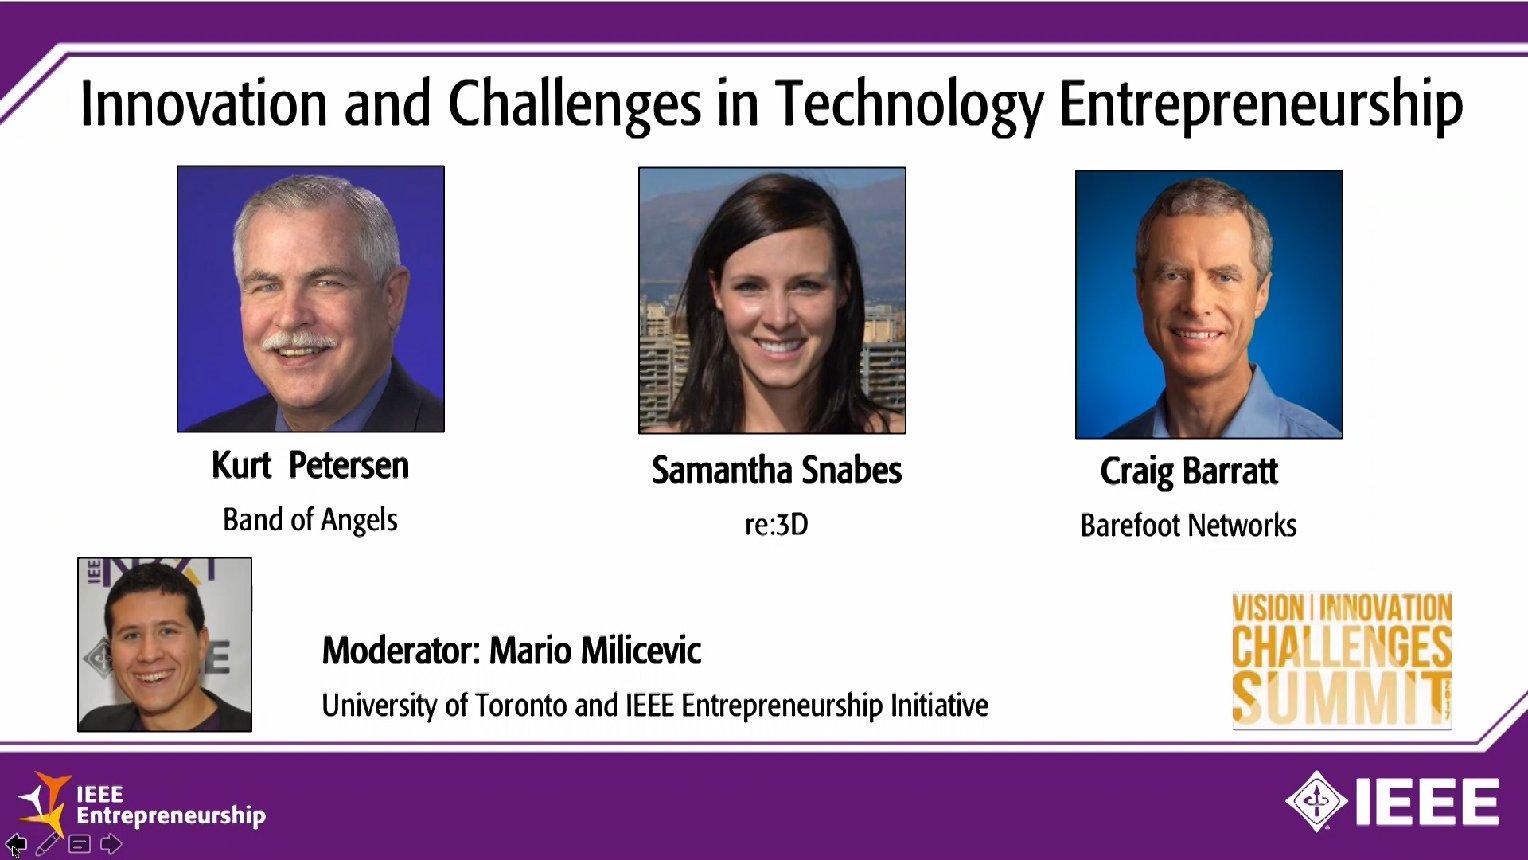 Entrepreneurship Panel - Innovation and Challenges in Technology Entrepreneurship (2017 VIC Summit)